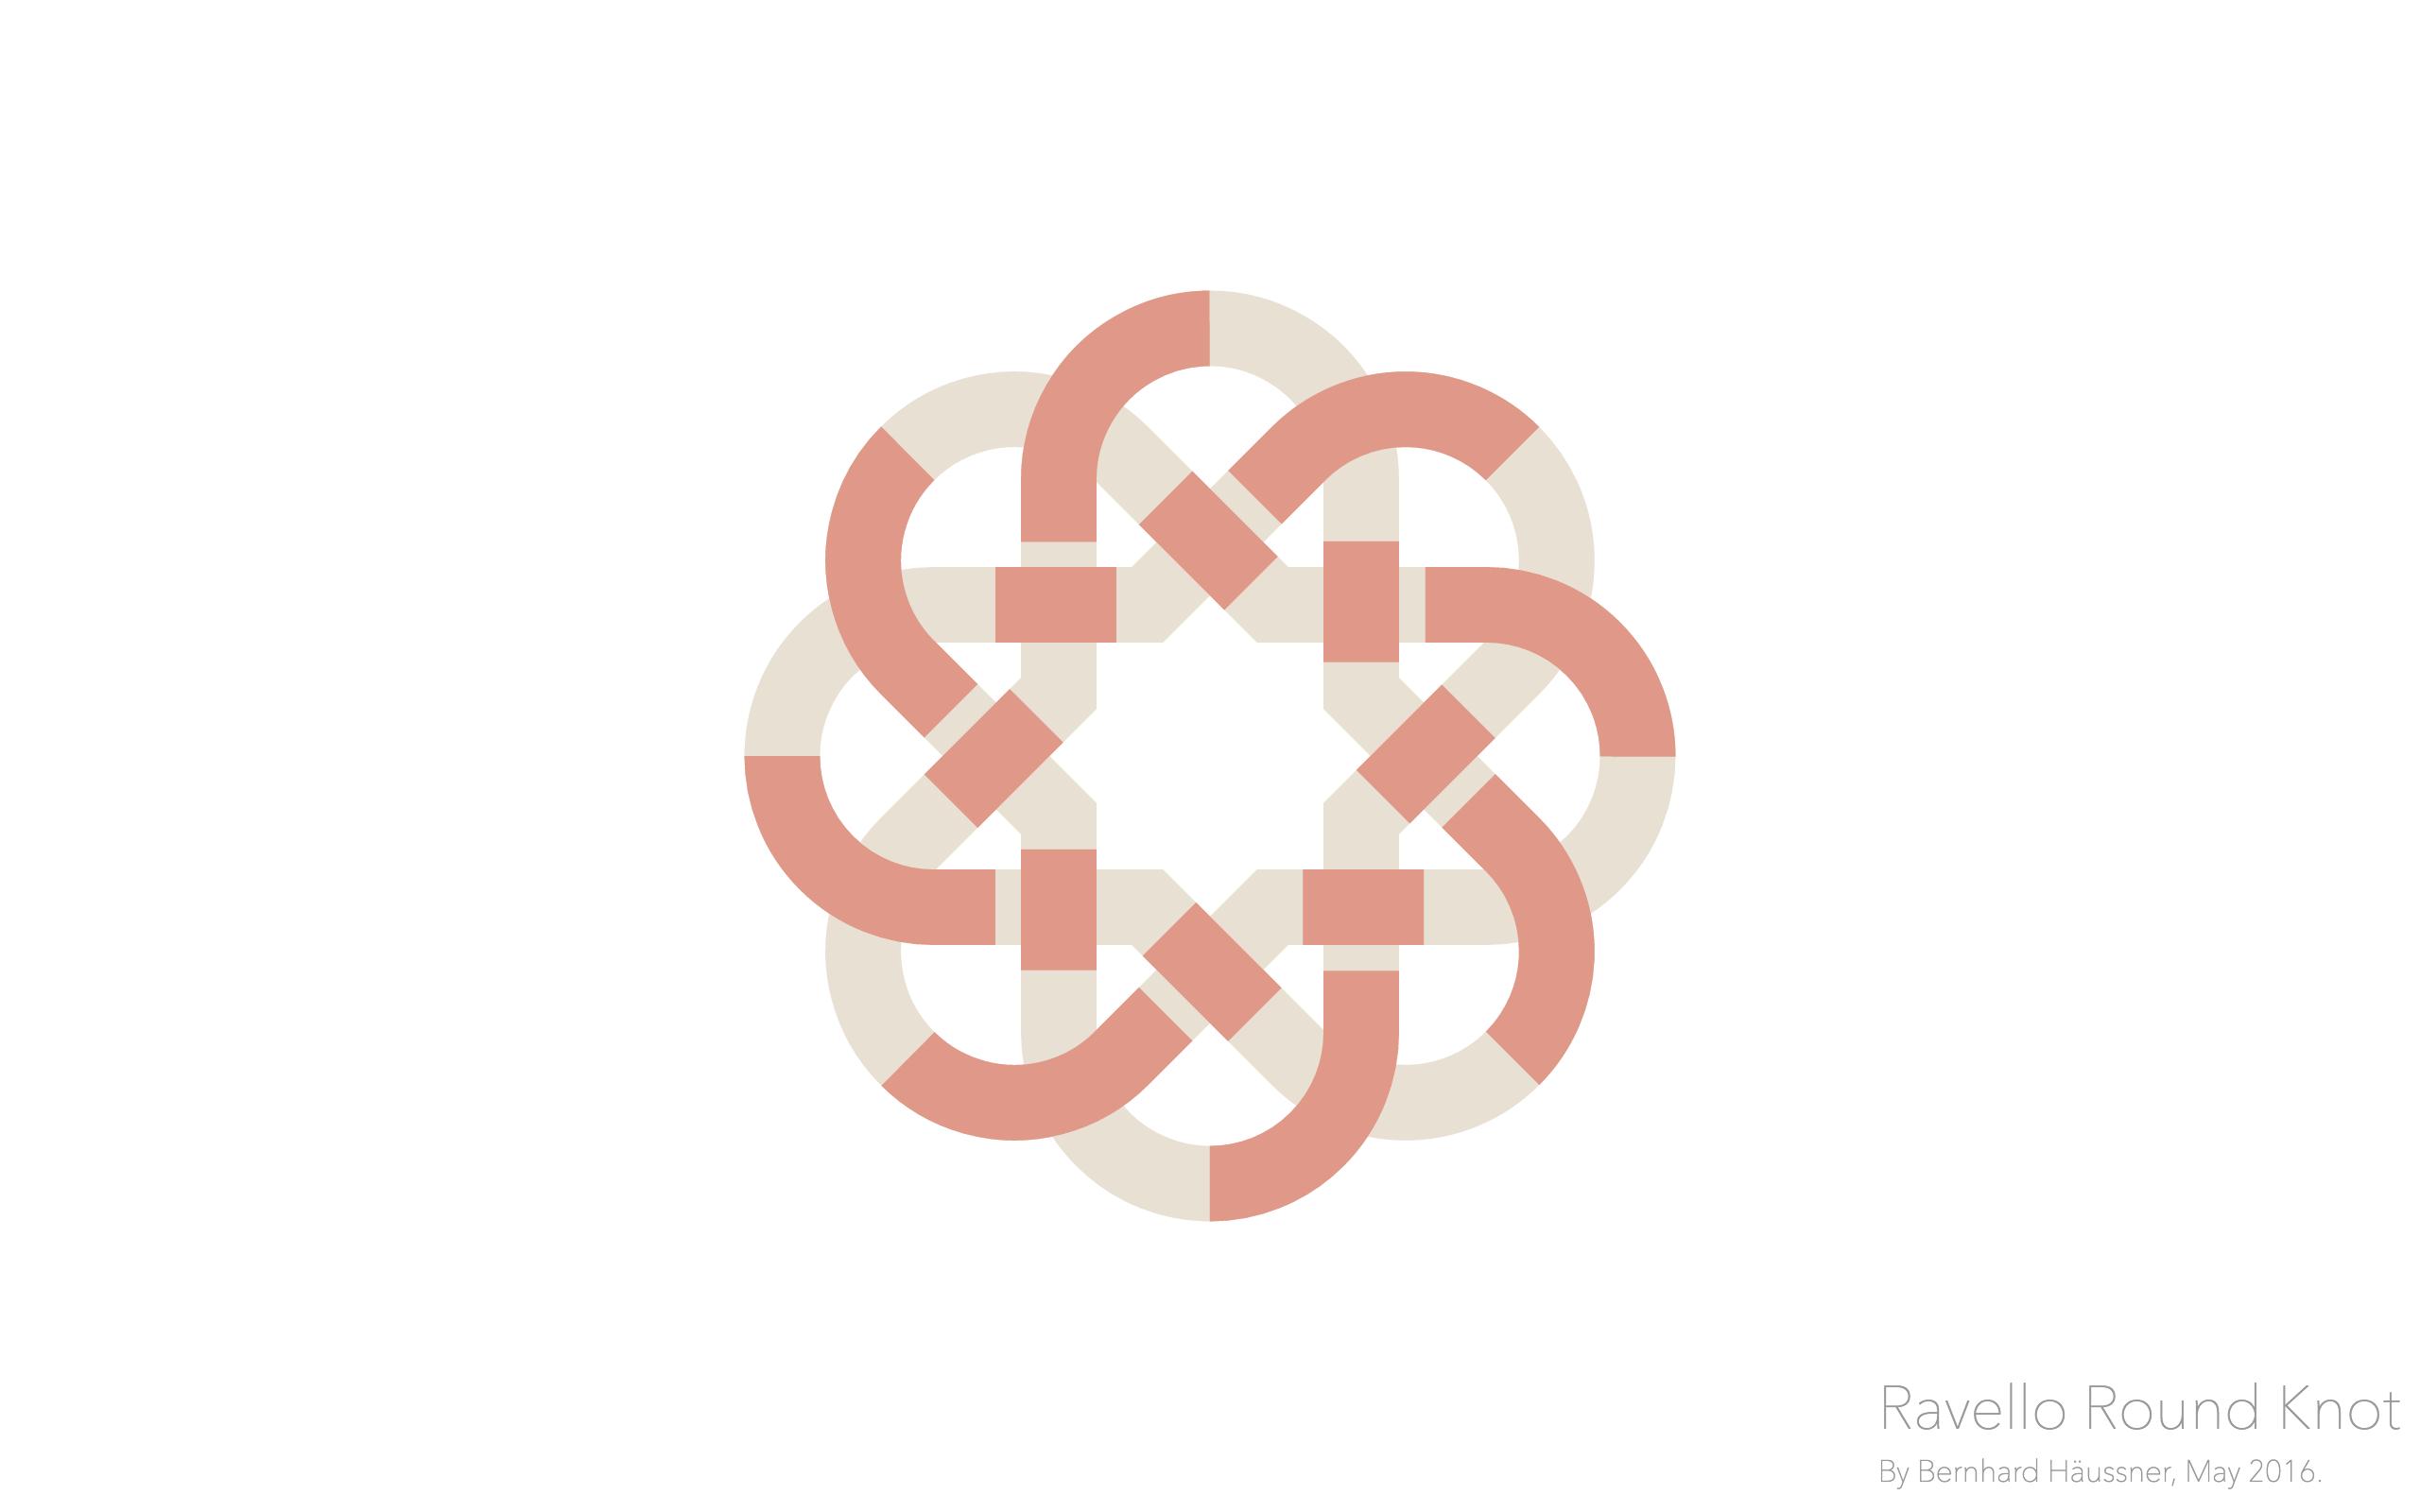 The Ravello Round Knot